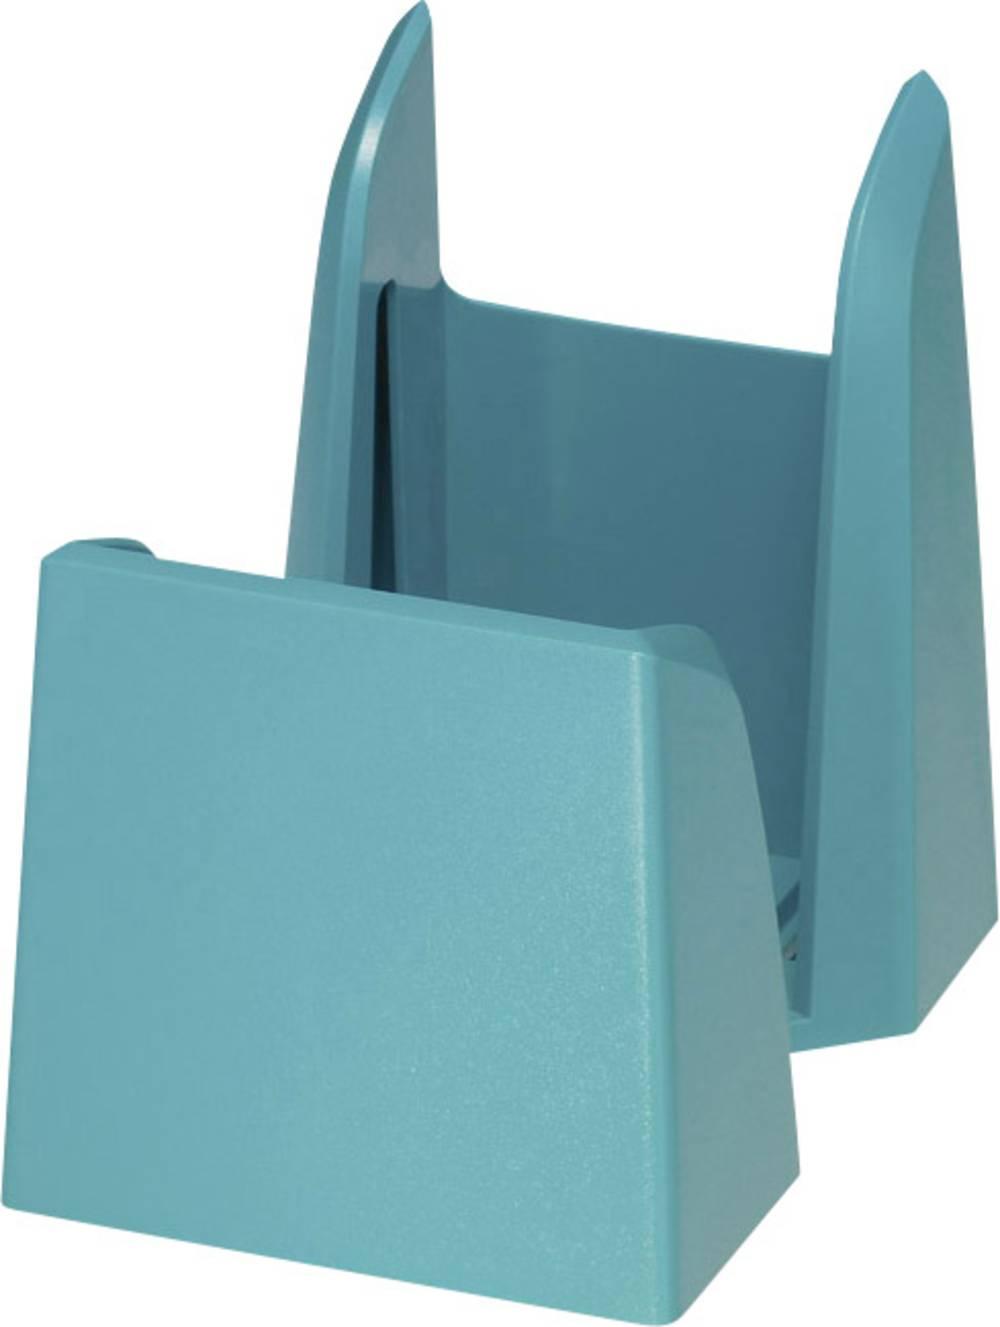 Stabelkabinet til Bluemark-printer Phoenix Contact BLUEMARK CLED-STACKER 20 5146656 1 stk